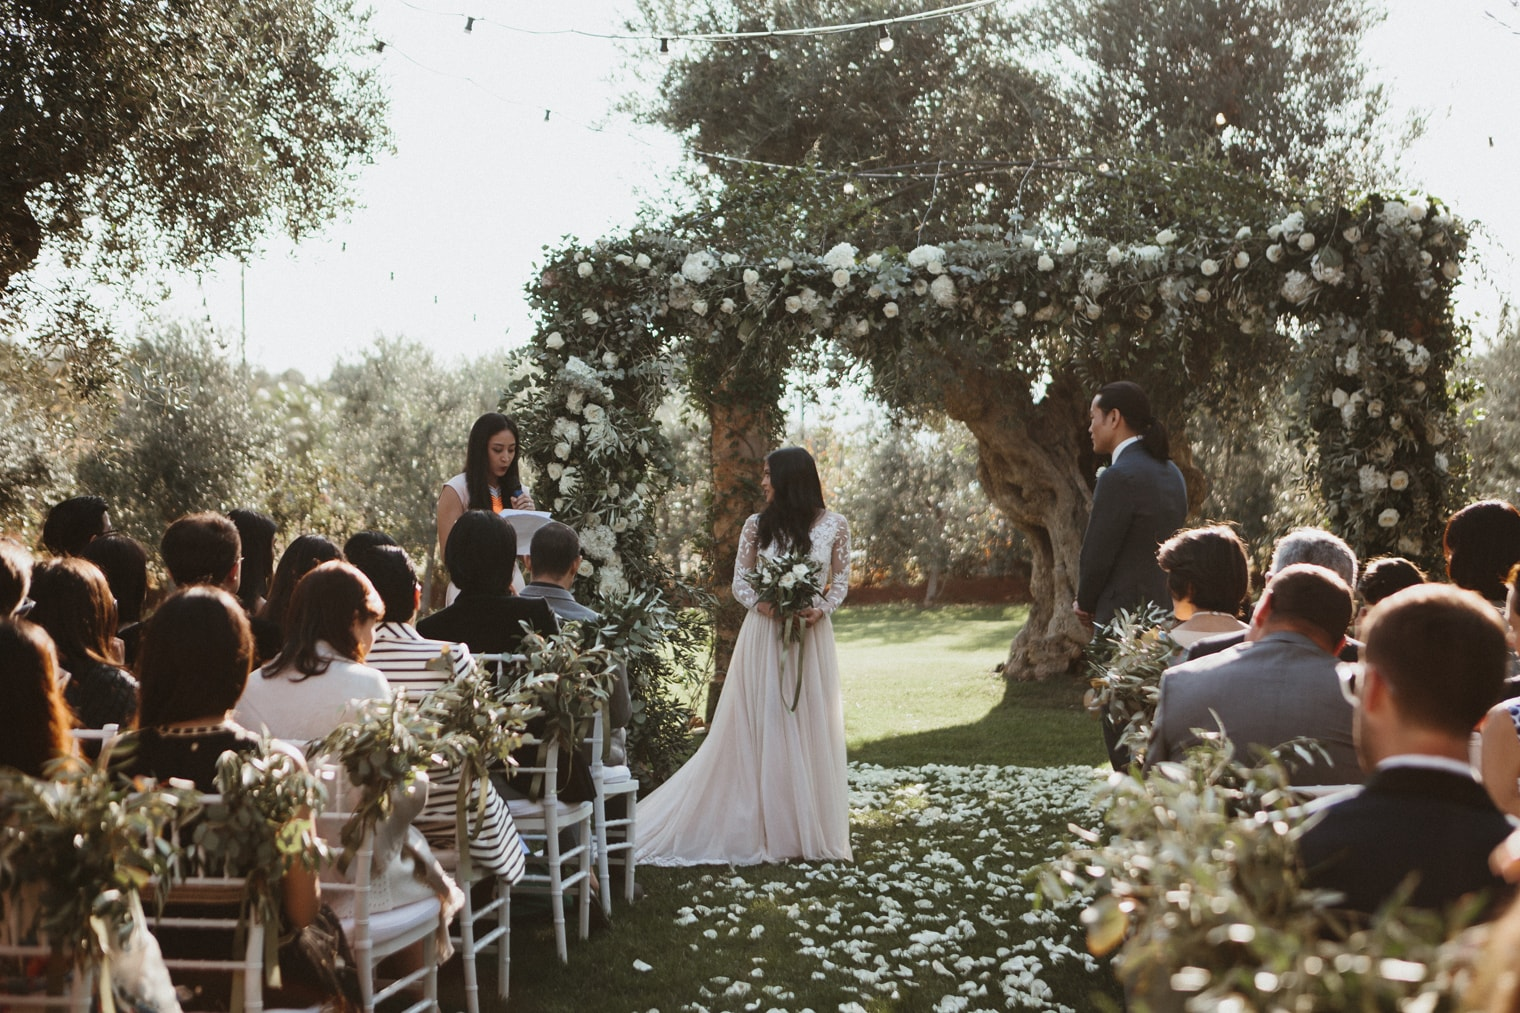 Beautiful floral arch at wedding ceremony in Puglia at masseria torre coccaro